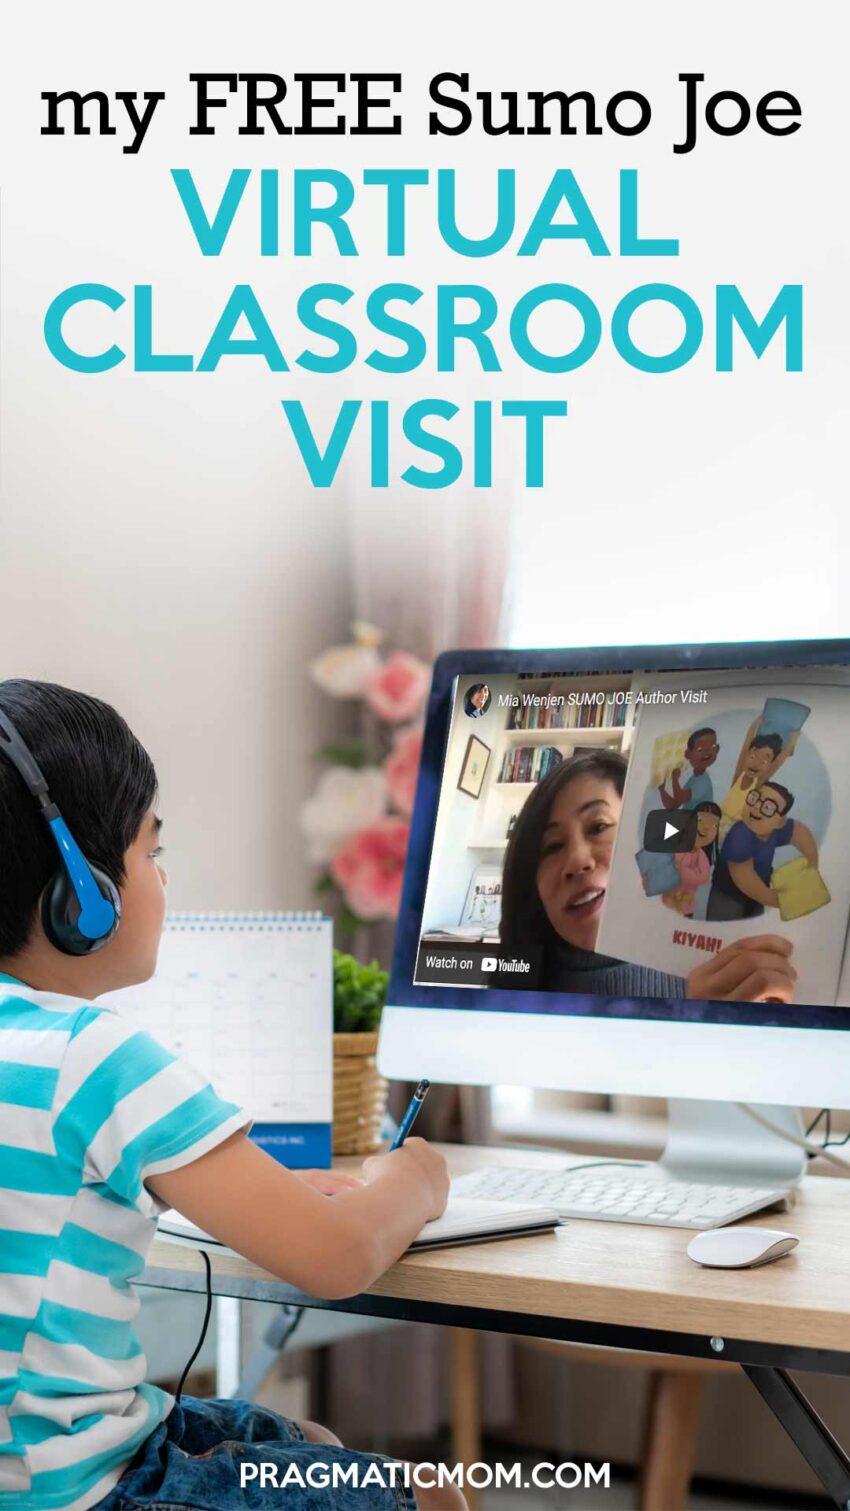 My FREE Sumo Joe Virtual Classroom Visit